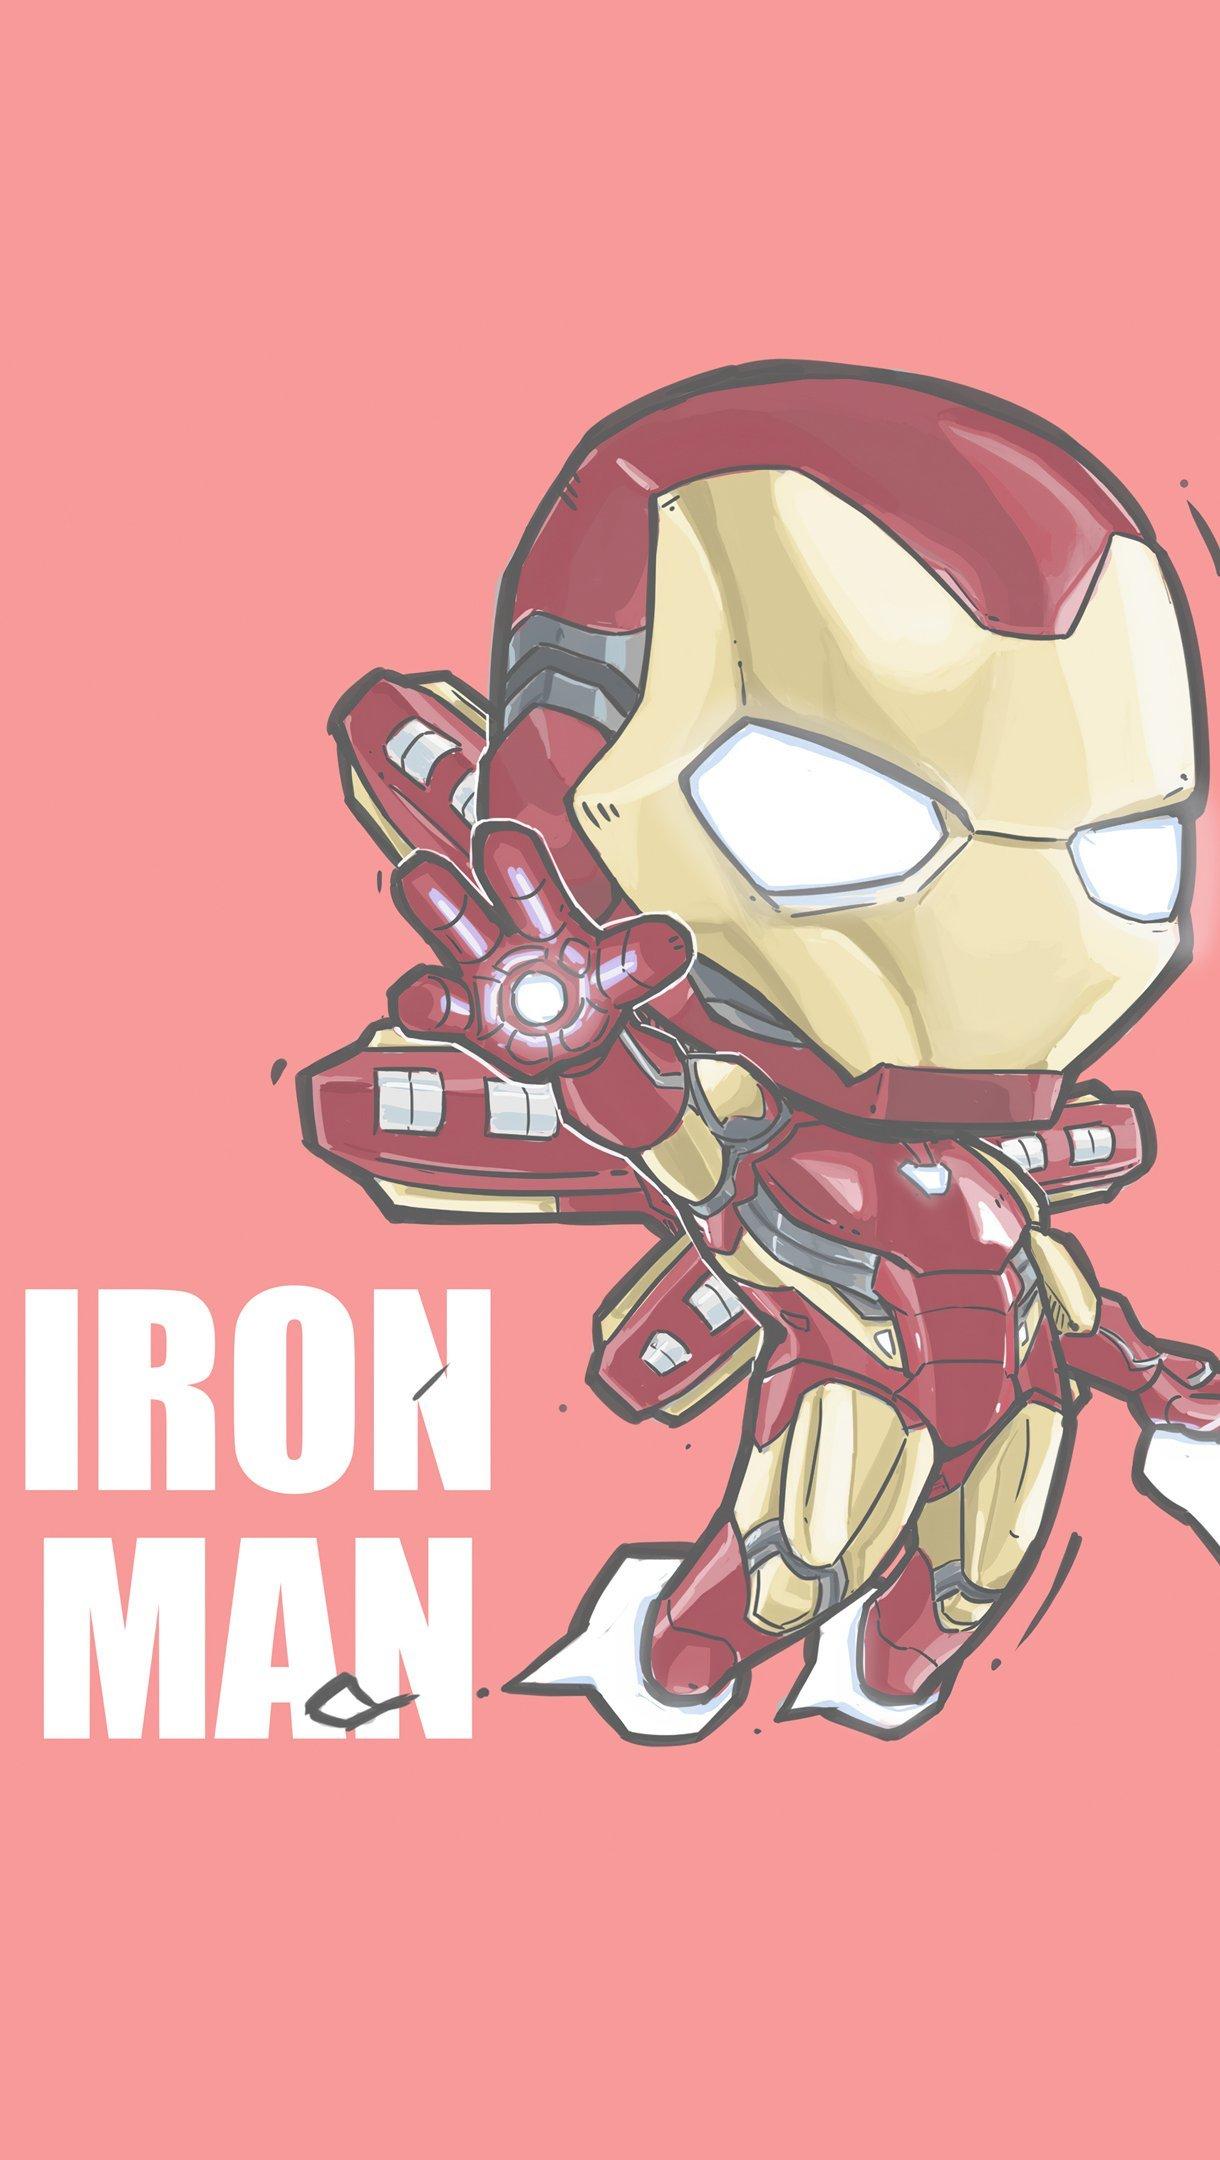 Wallpaper Iron Man Minimalist Vertical